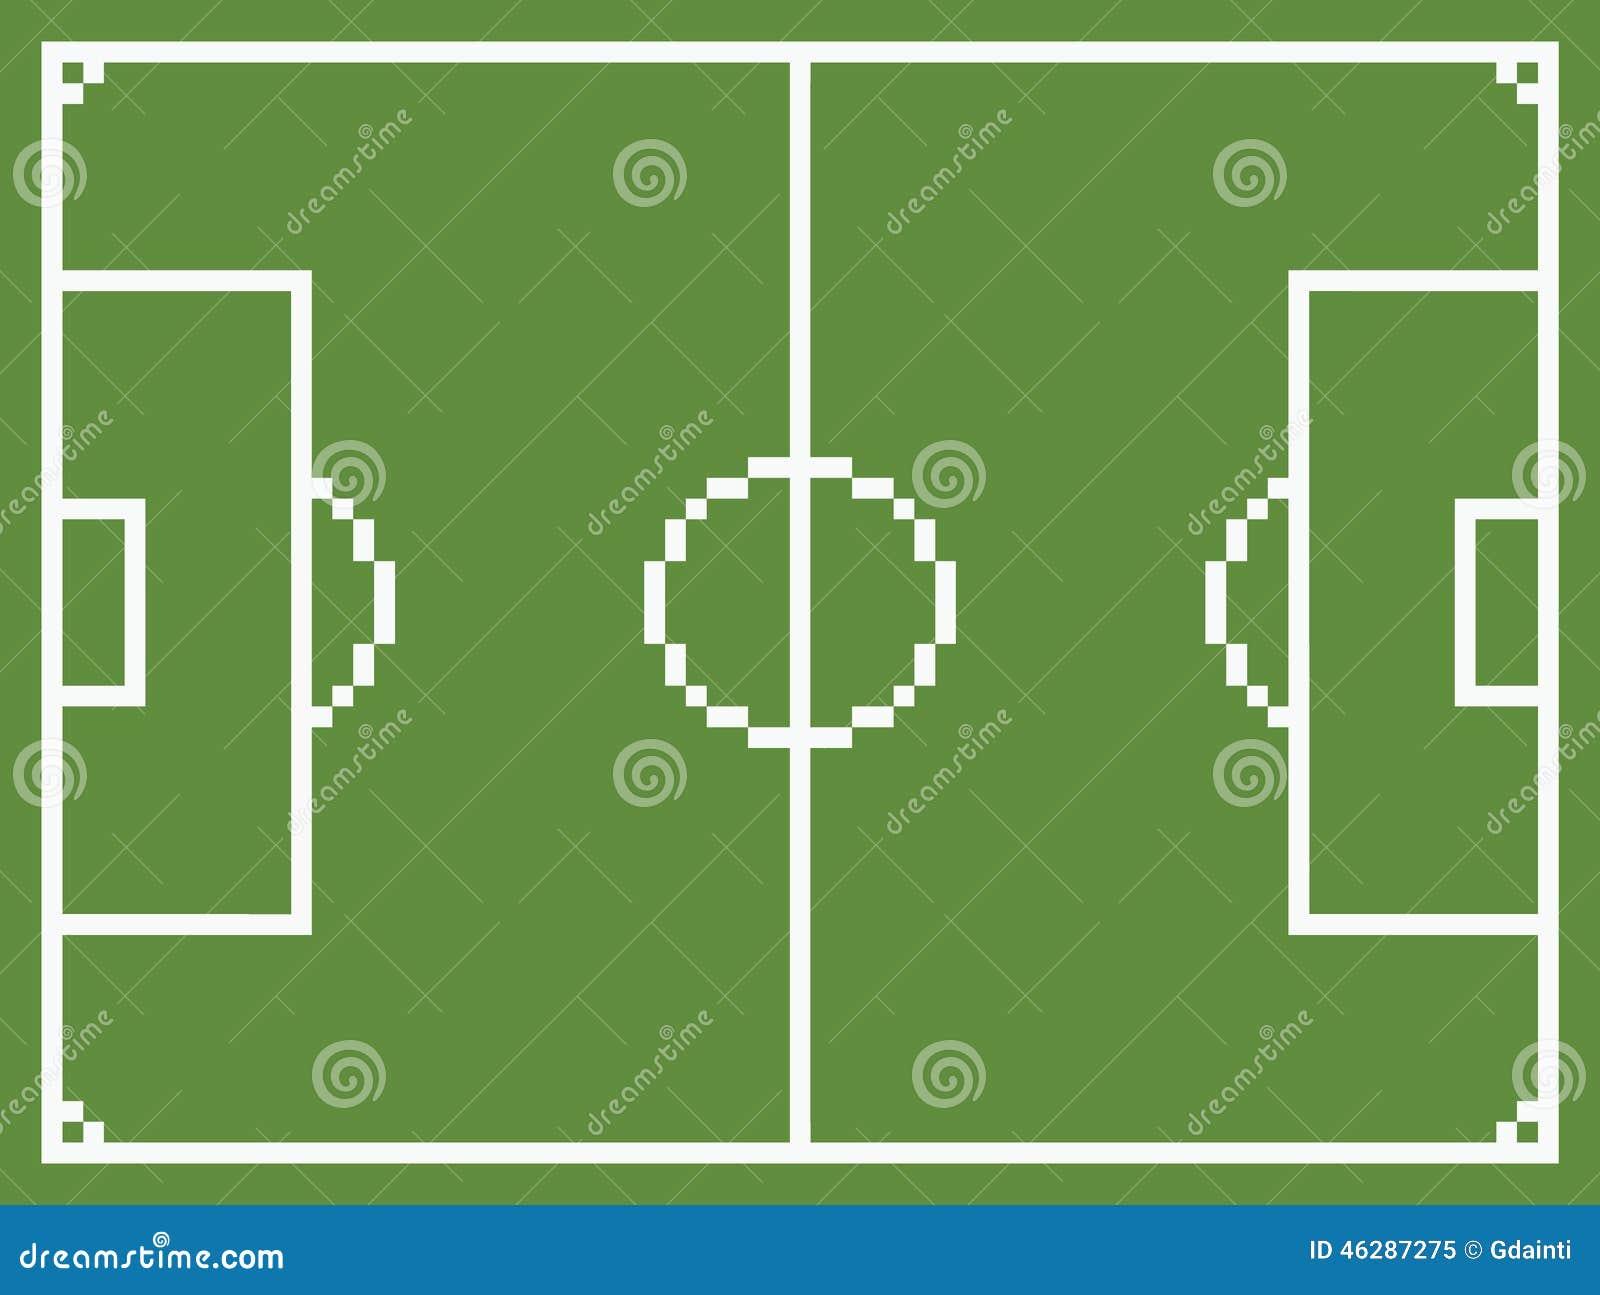 Pixel Art Style Football Sport Field Soccer Stock Vector - Image: 46287275